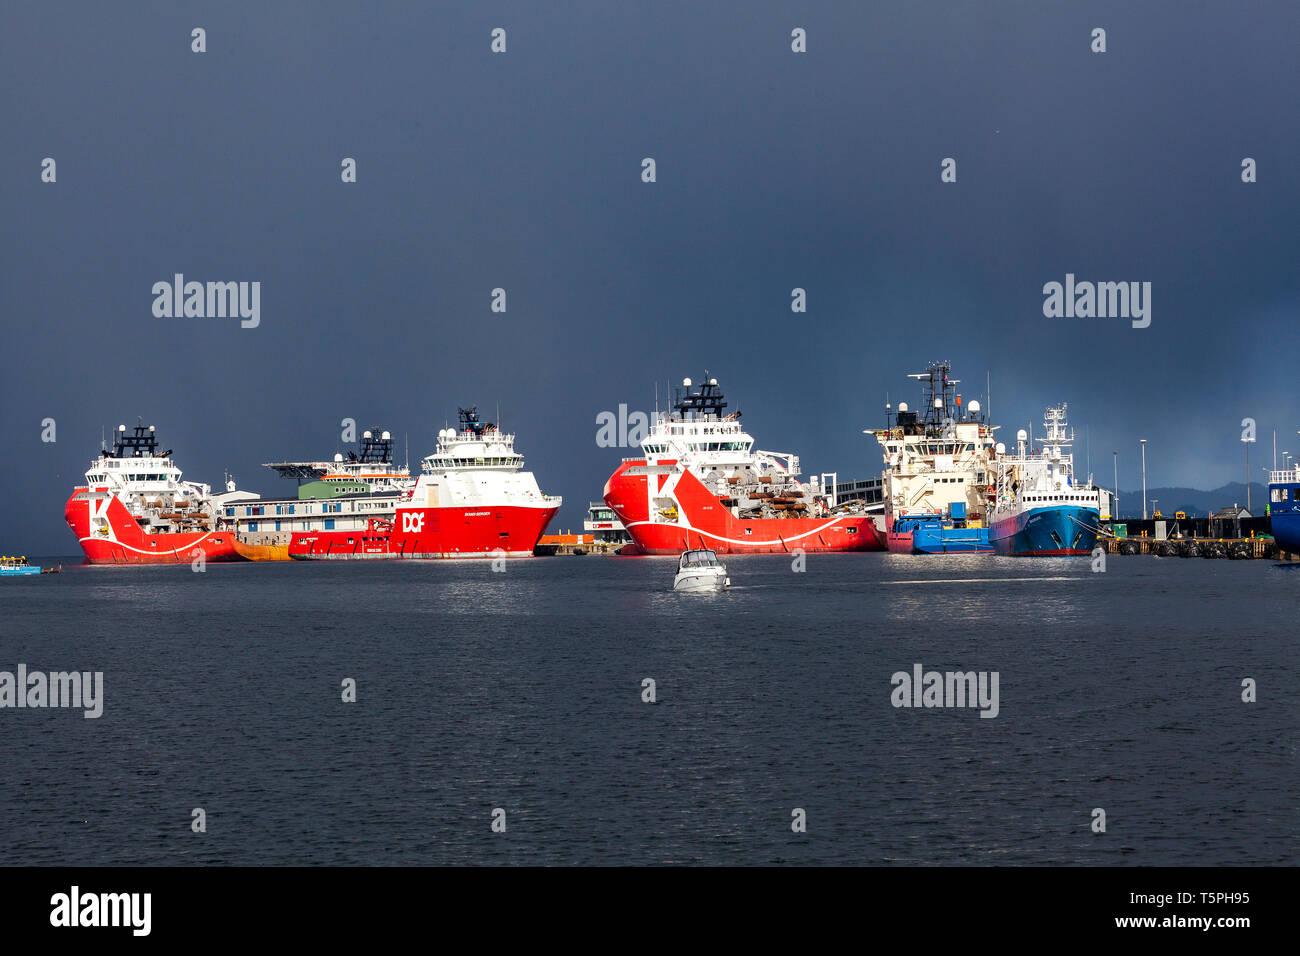 Offshore supply vessels KL Sandefjord, Skandi Bergen, KL Saltfjord and Deep Vision, in the port of Bergen, Norway. Skoltegrunnskaien terminal. A heavy - Stock Image